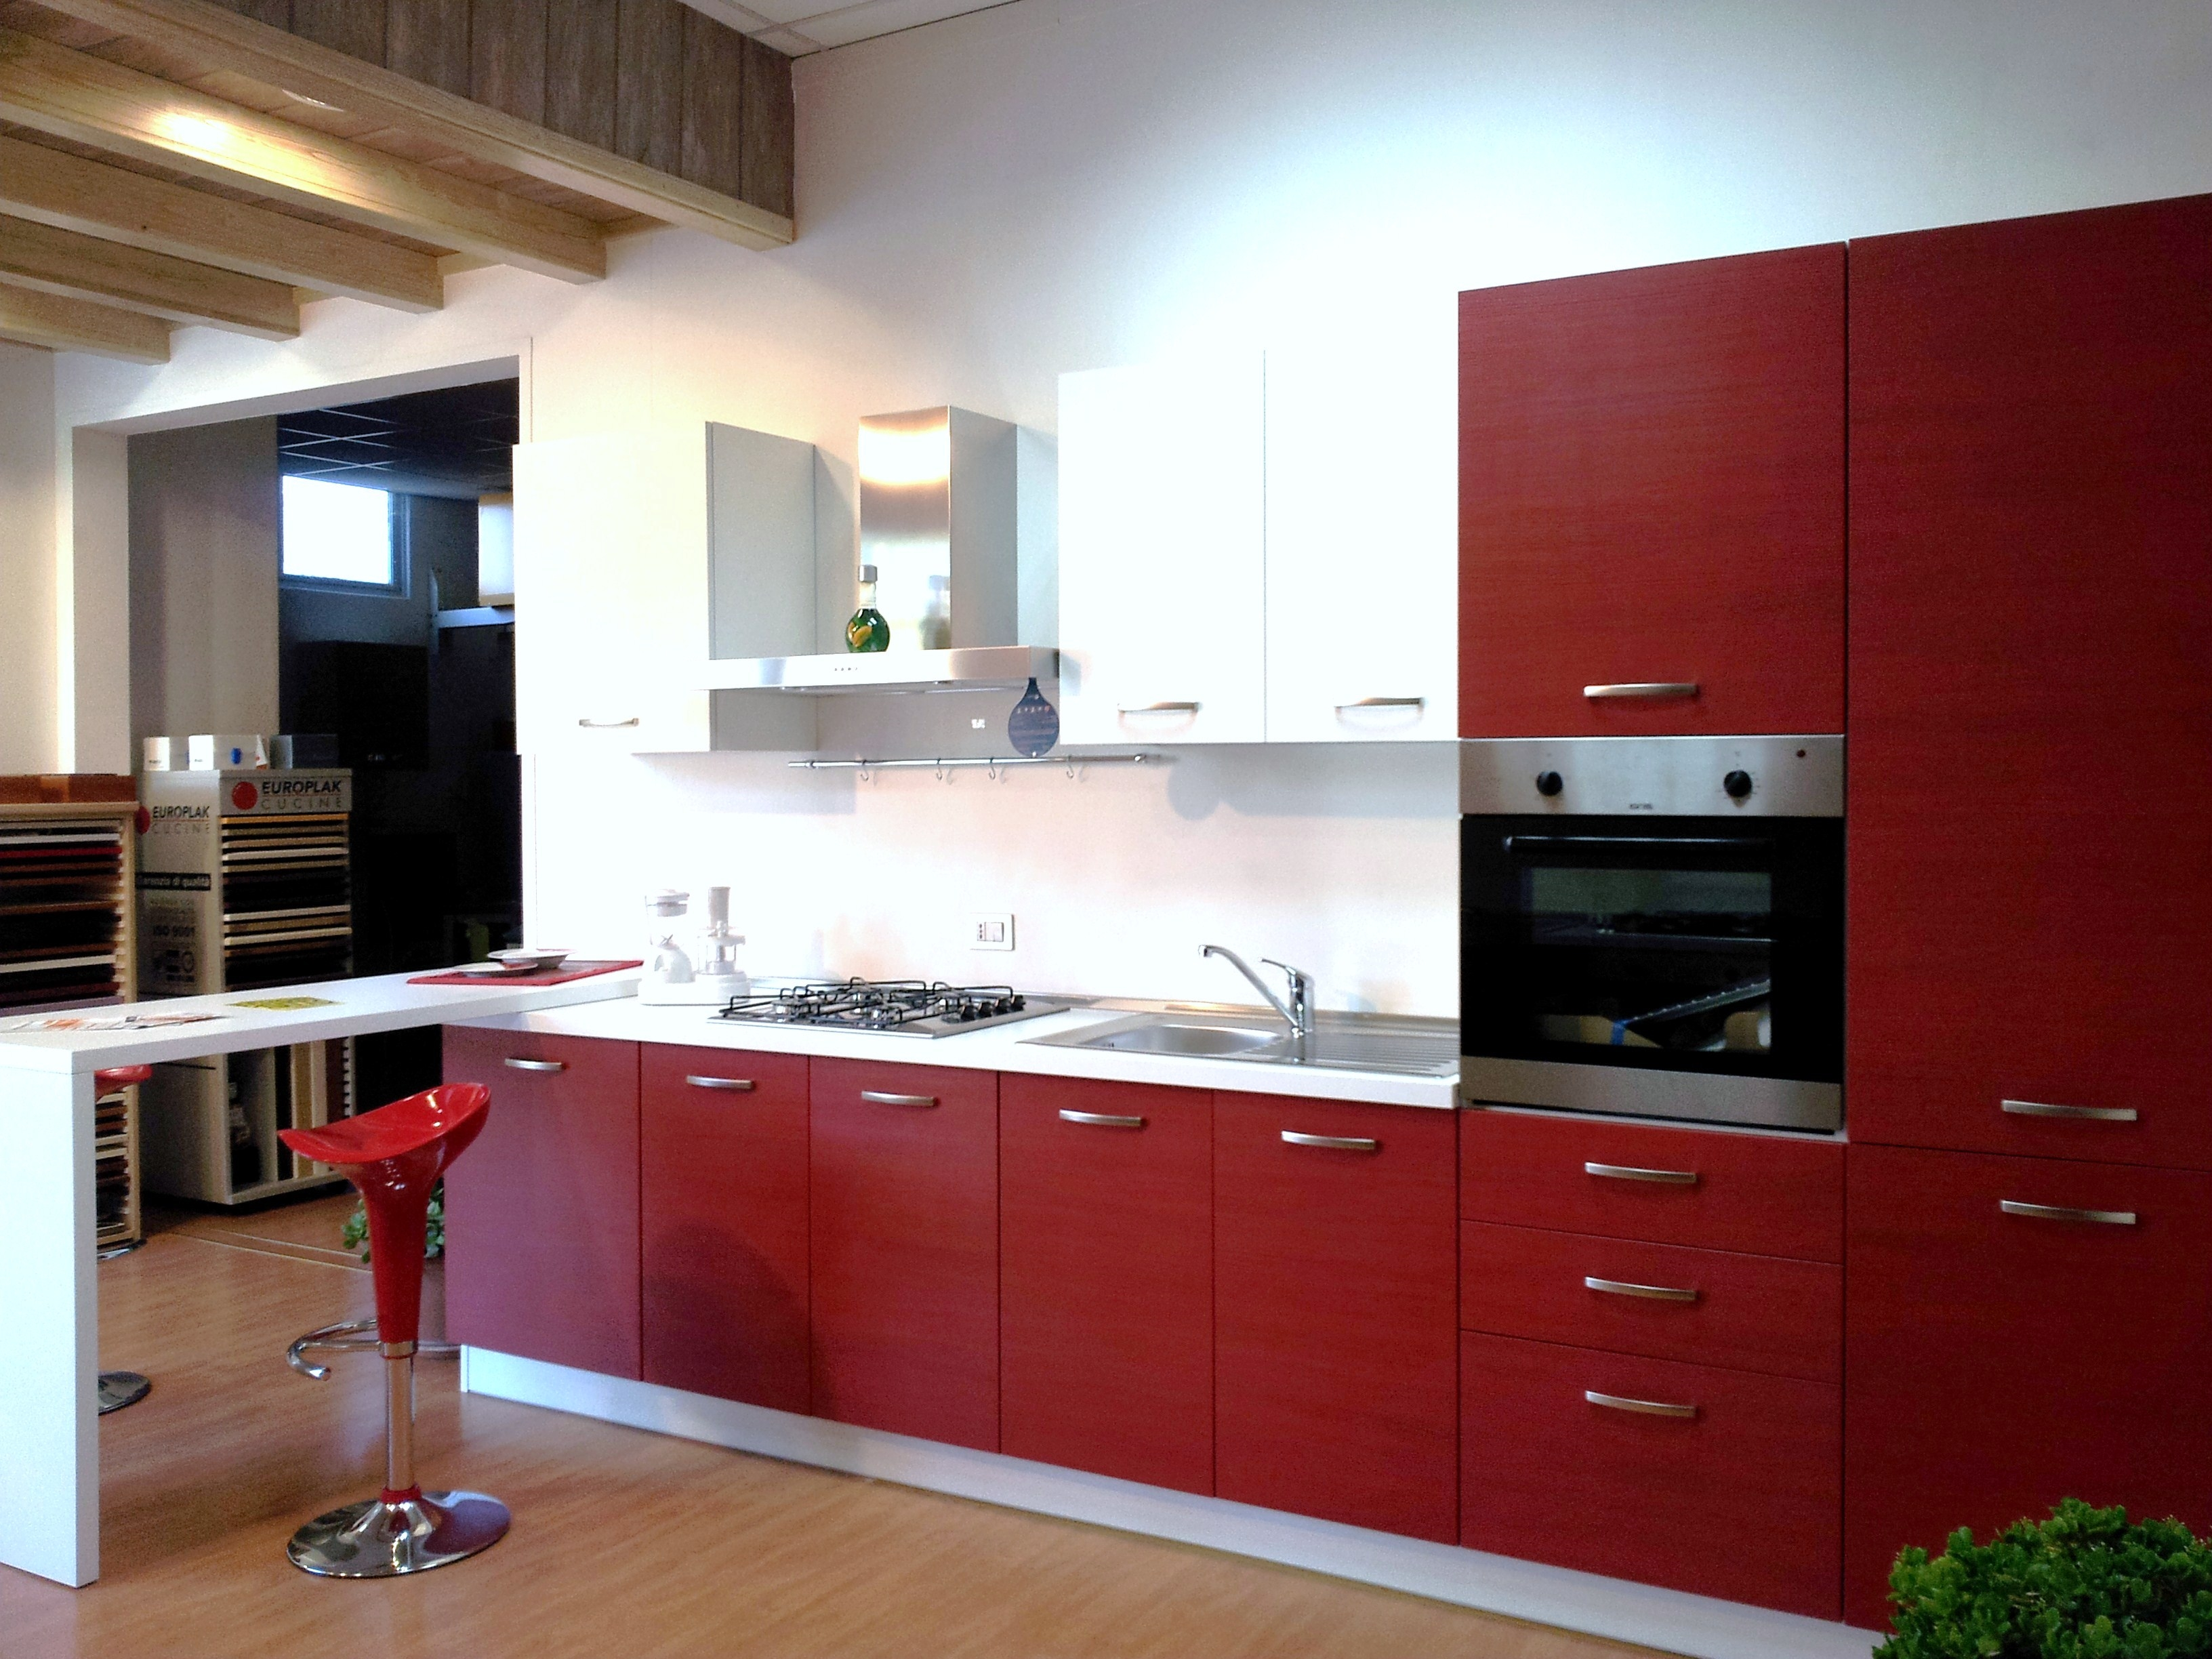 Cucine provenzali moderne sicc cucine cucine componibili moderne classiche in muratura e su - Mobili sme prezzi ...